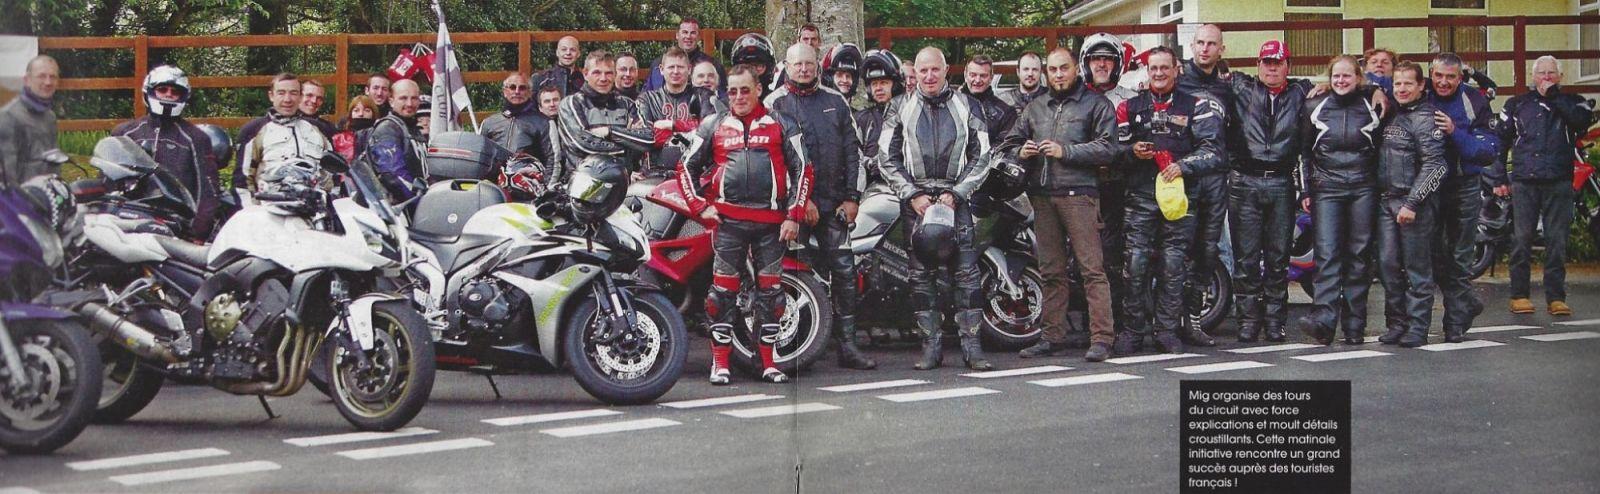 photo moto journal fabrice miguet ile de man 2014